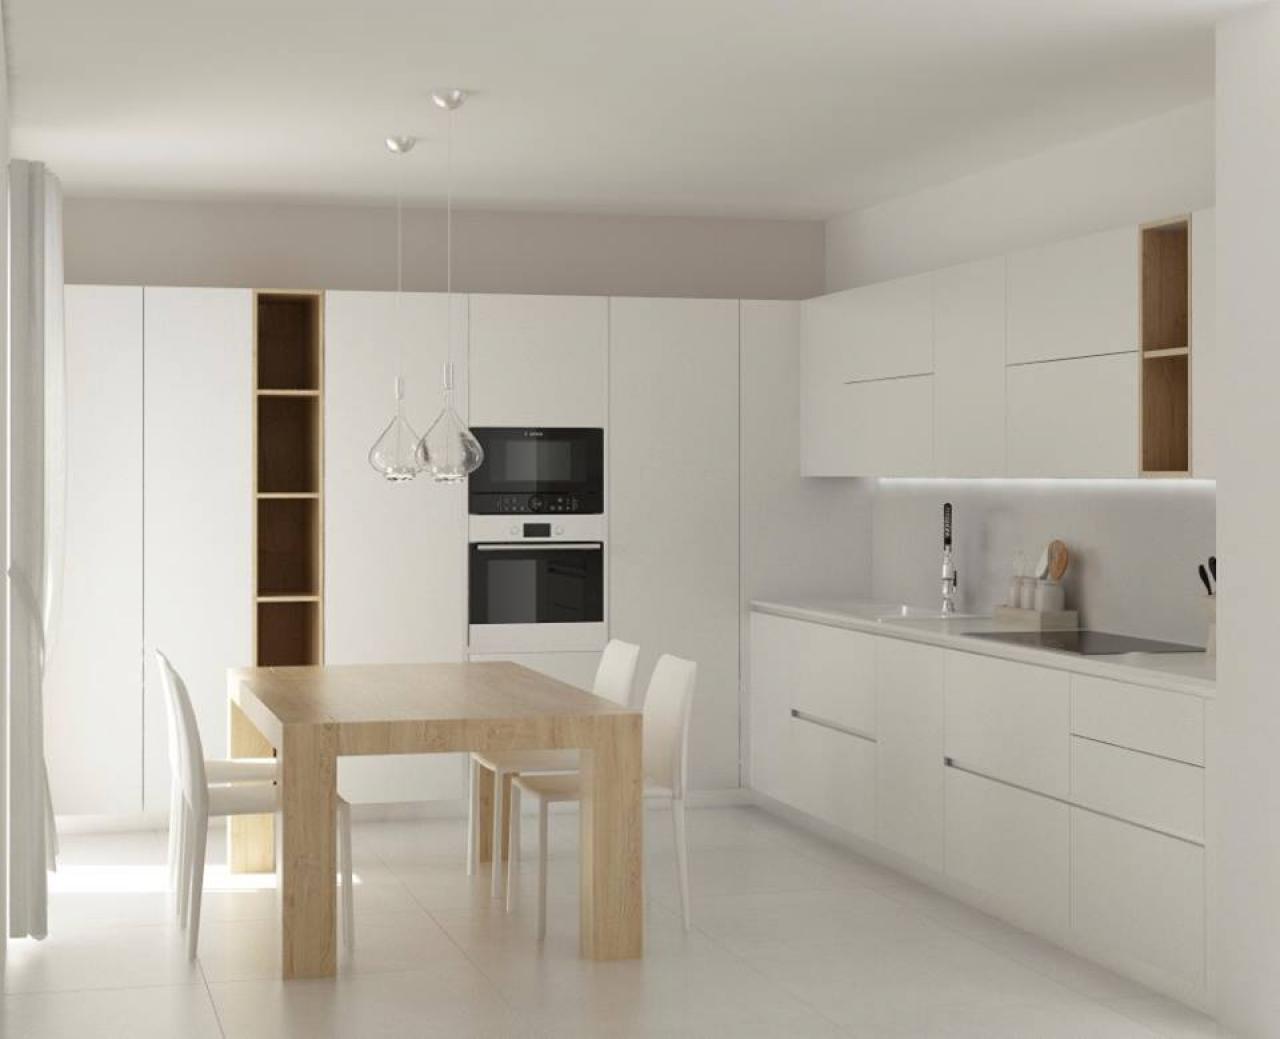 Cucina moderna tavolo separato o penisola fratelli - Cucina bianca legno ...